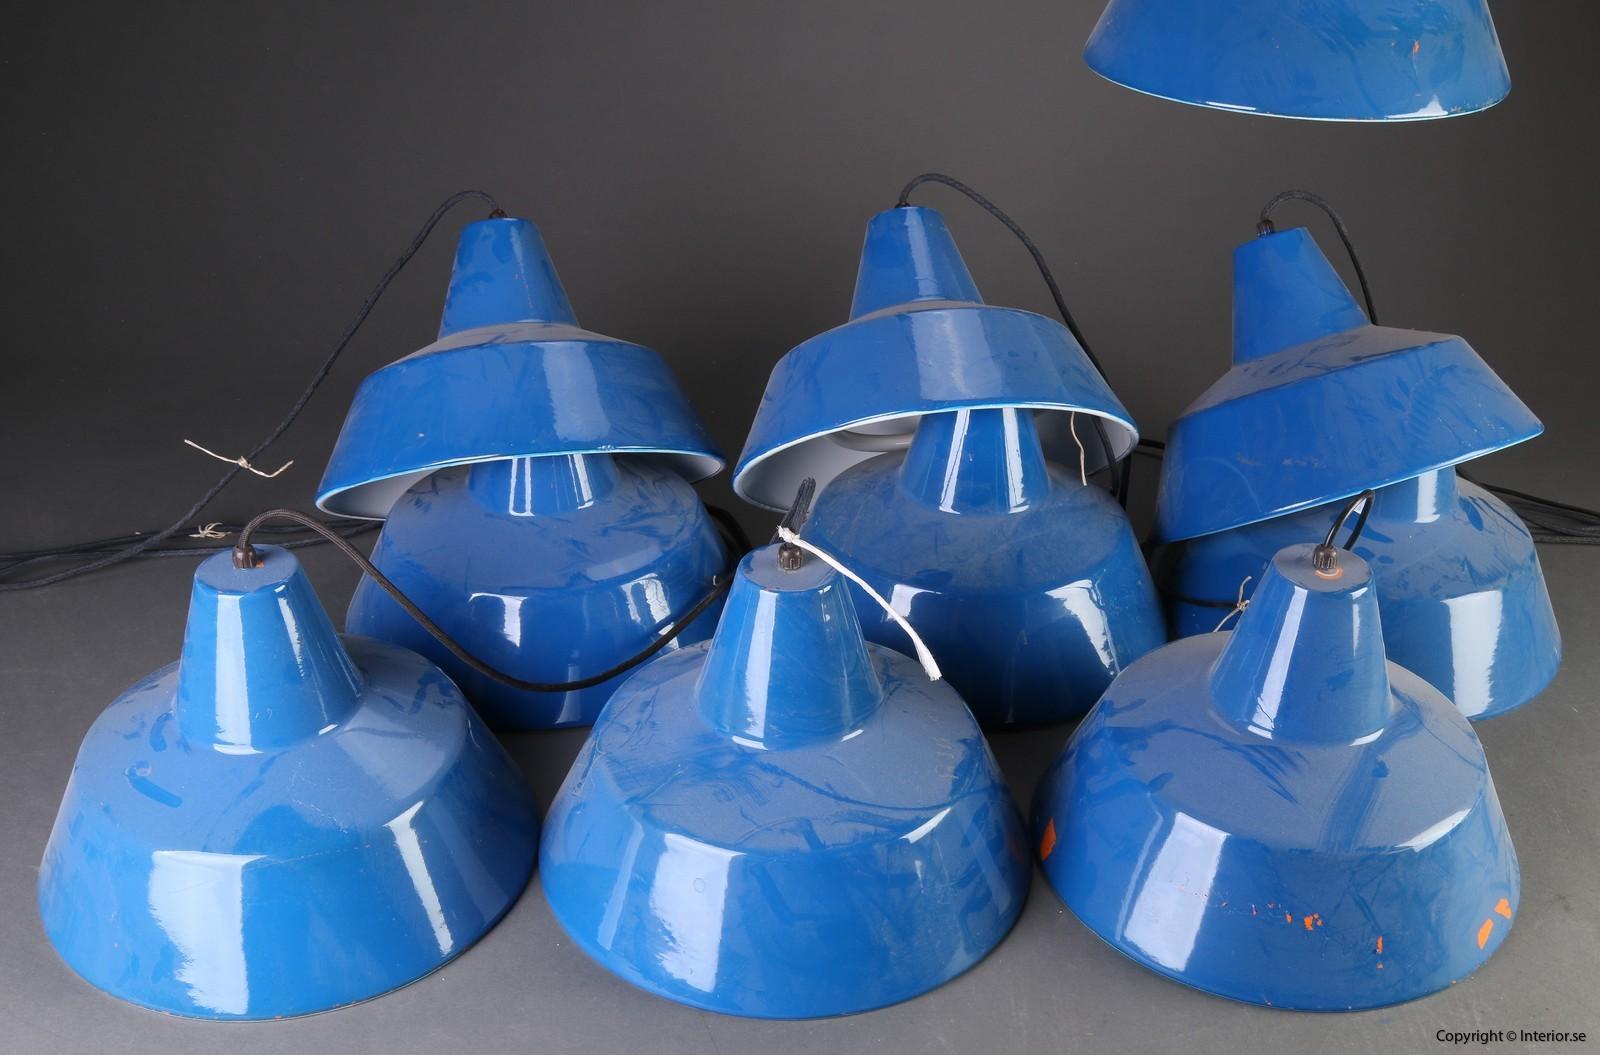 Louis Poulsen Industri lampor - Blå Industri industry design